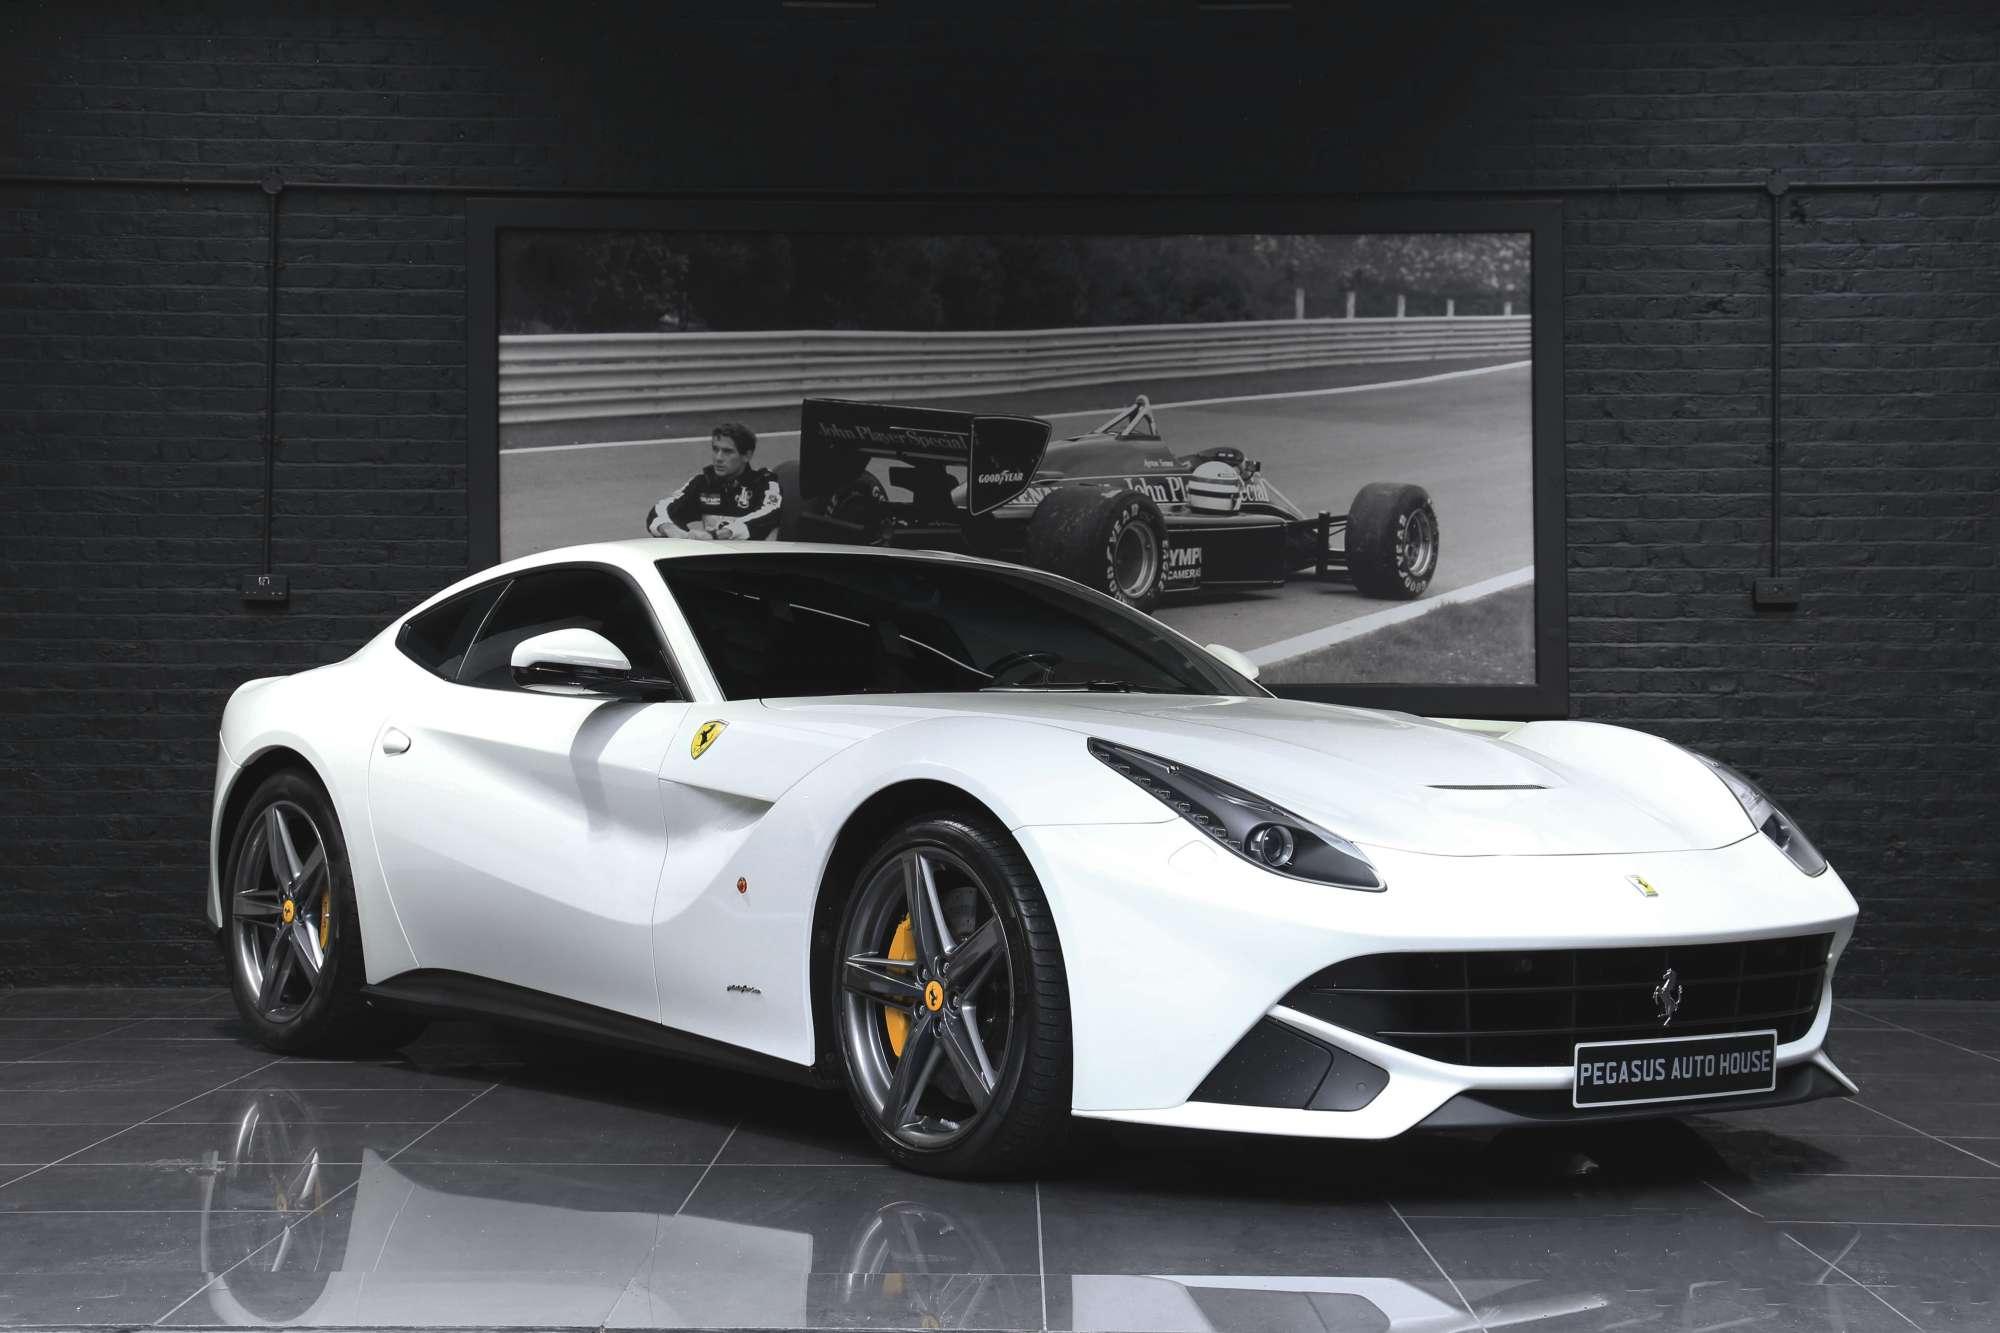 Ferrari 812 Superfast Price >> LHD FERRARI F12 - Pegasus Auto House